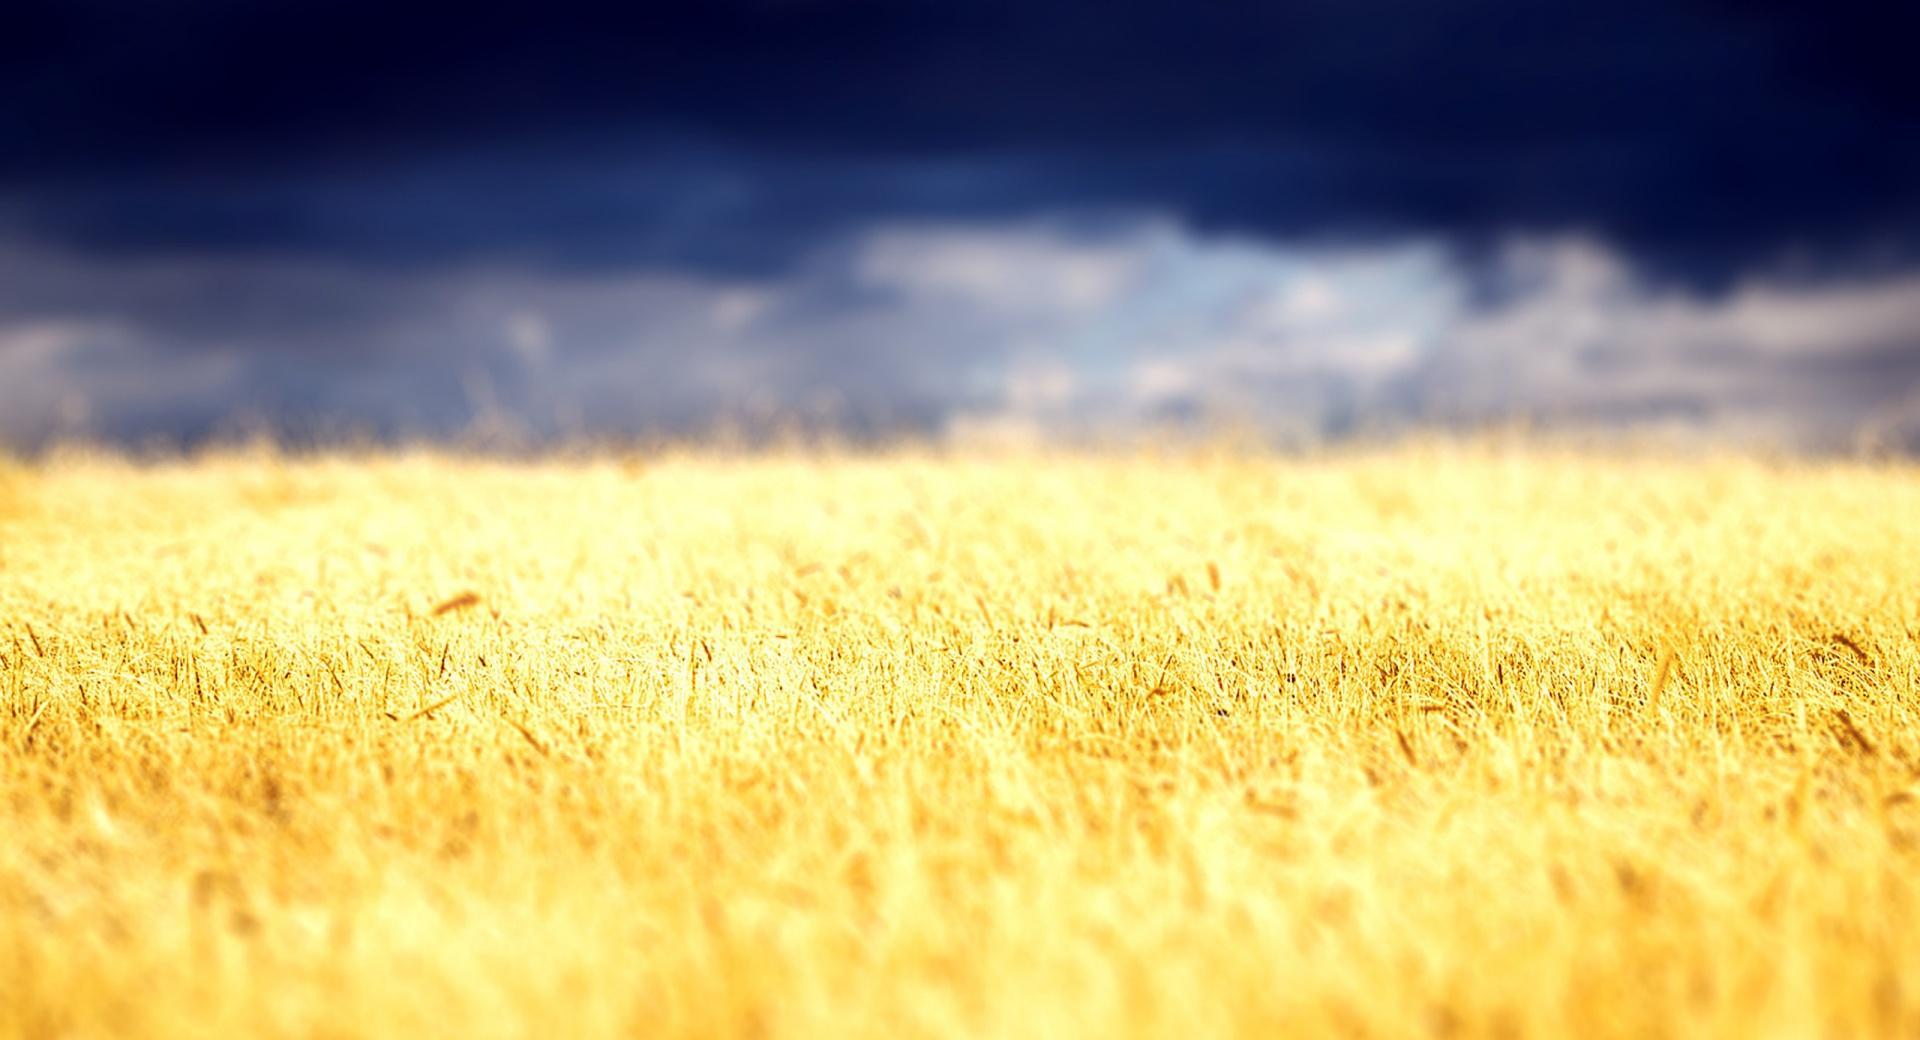 Beautiful Crop Field wallpapers HD quality